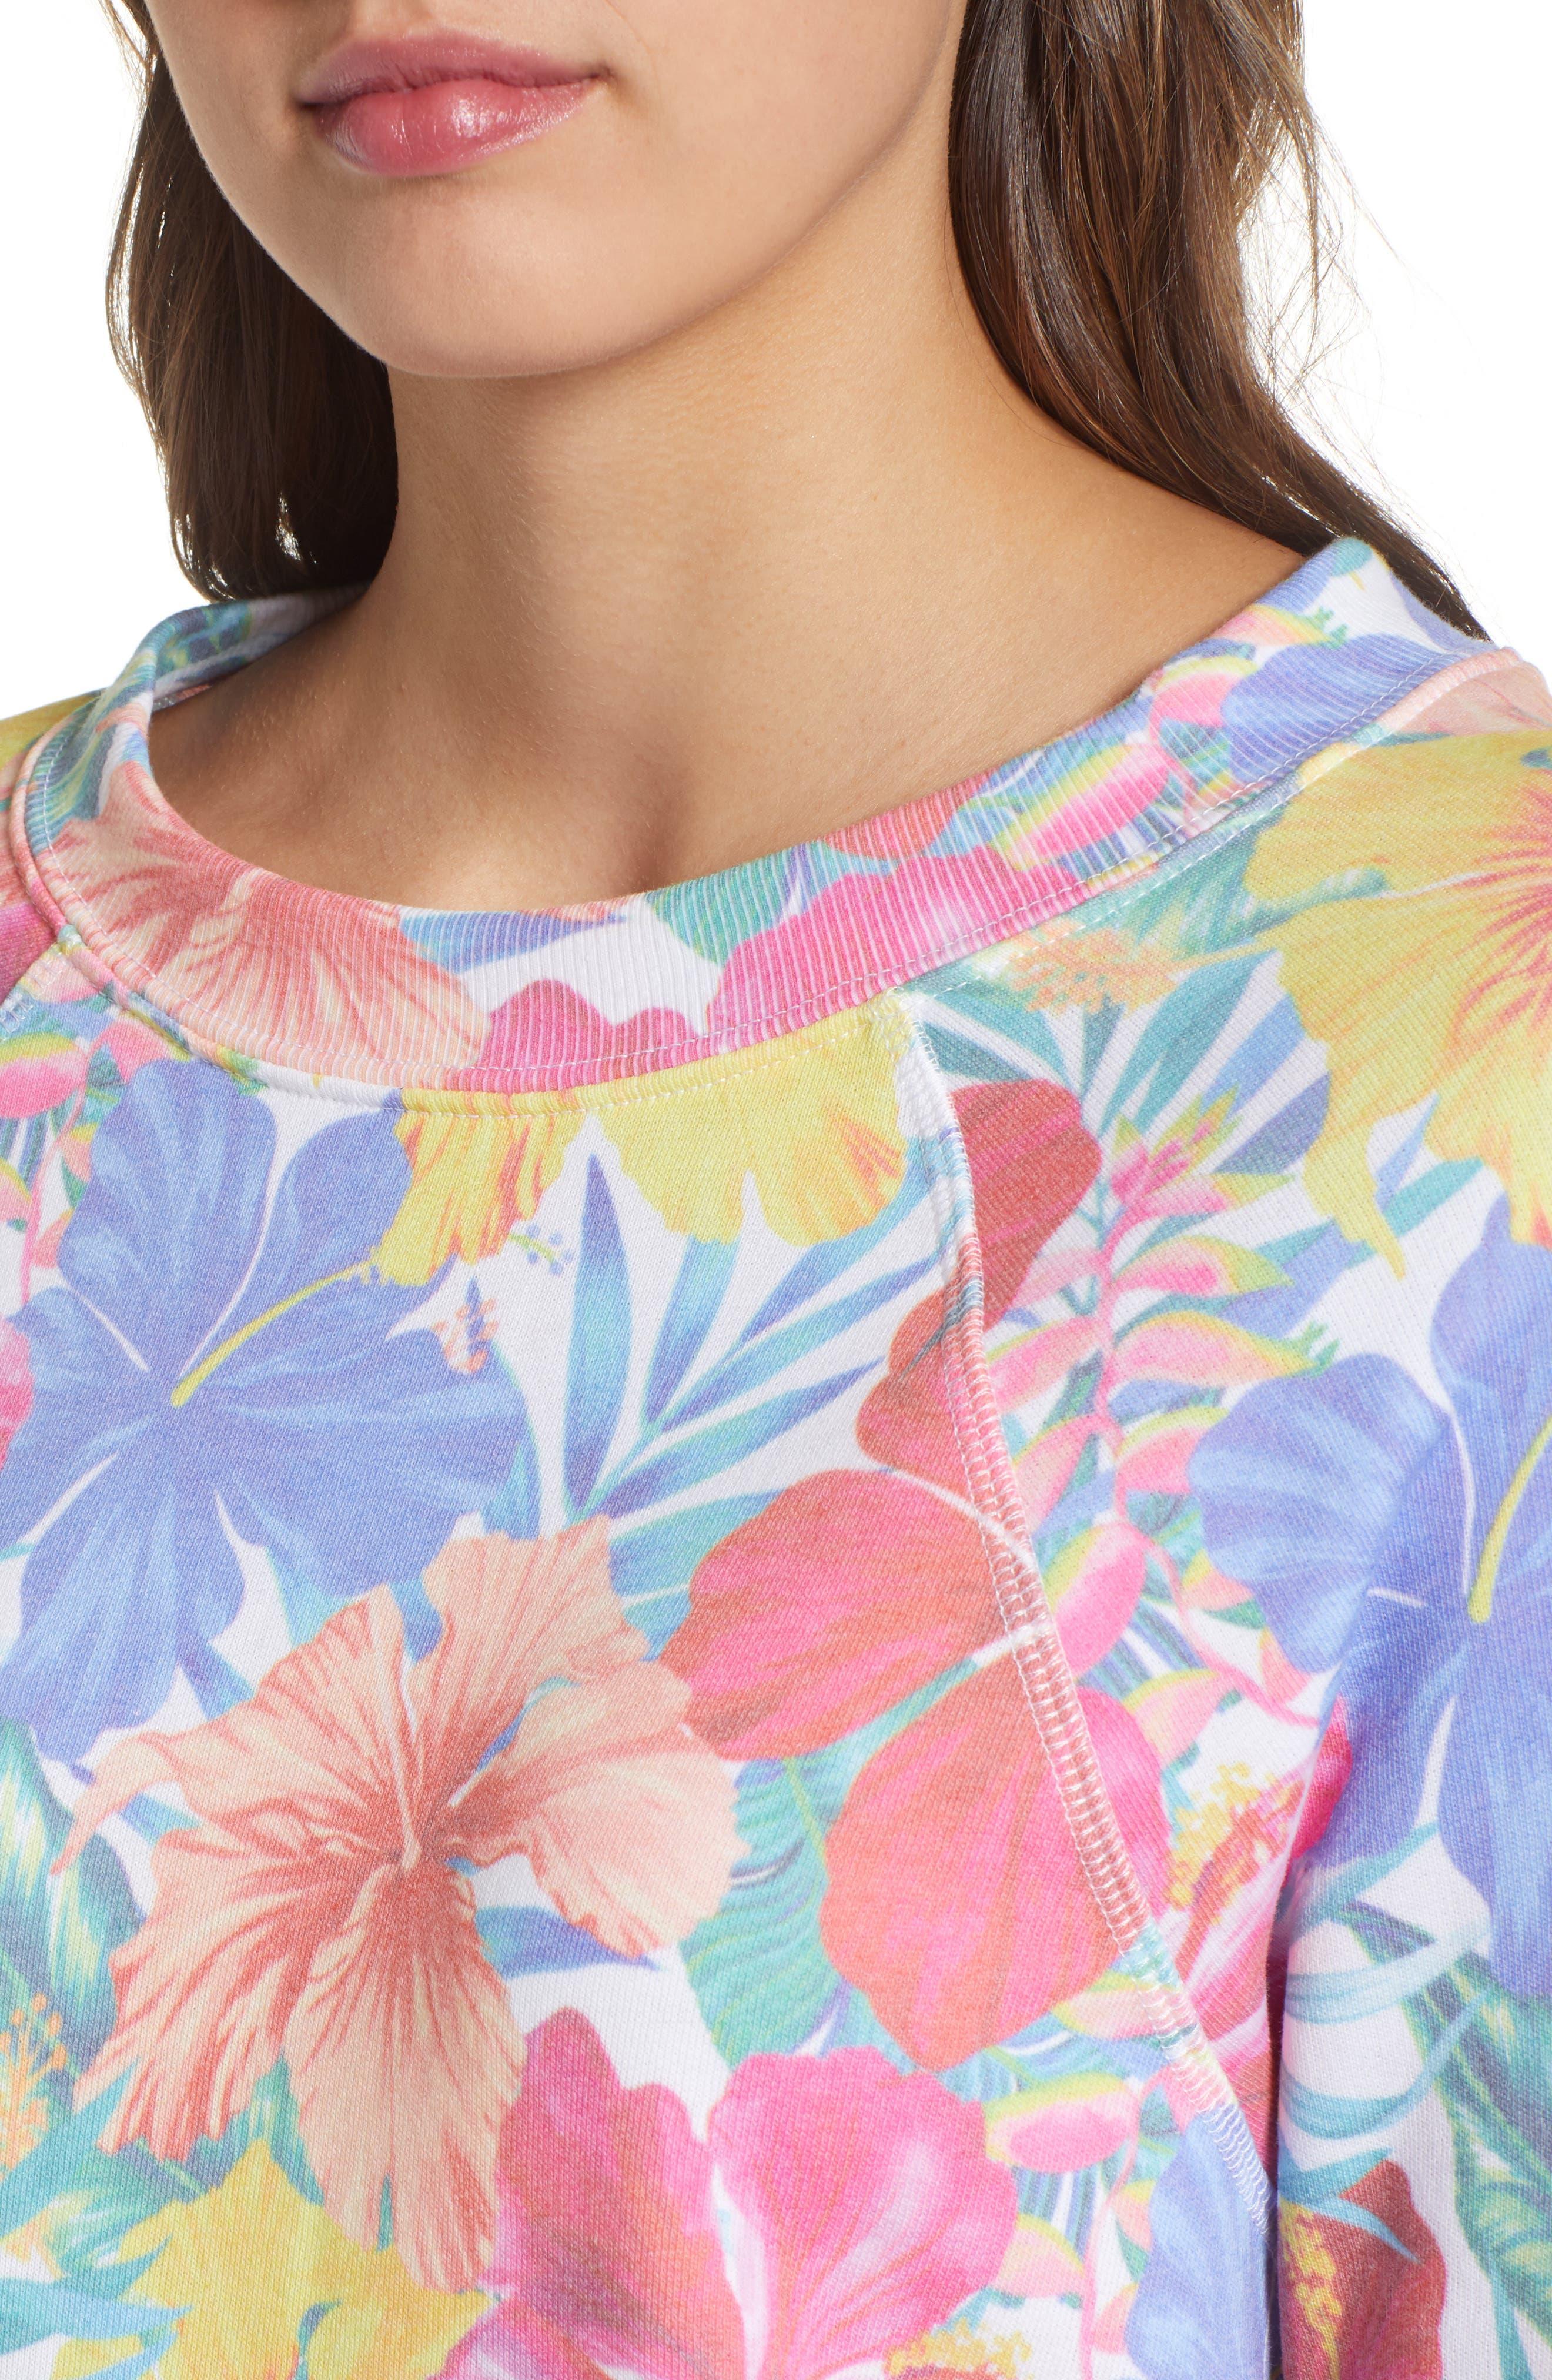 Tropicalia Sommers Sweatshirt,                             Alternate thumbnail 4, color,                             650